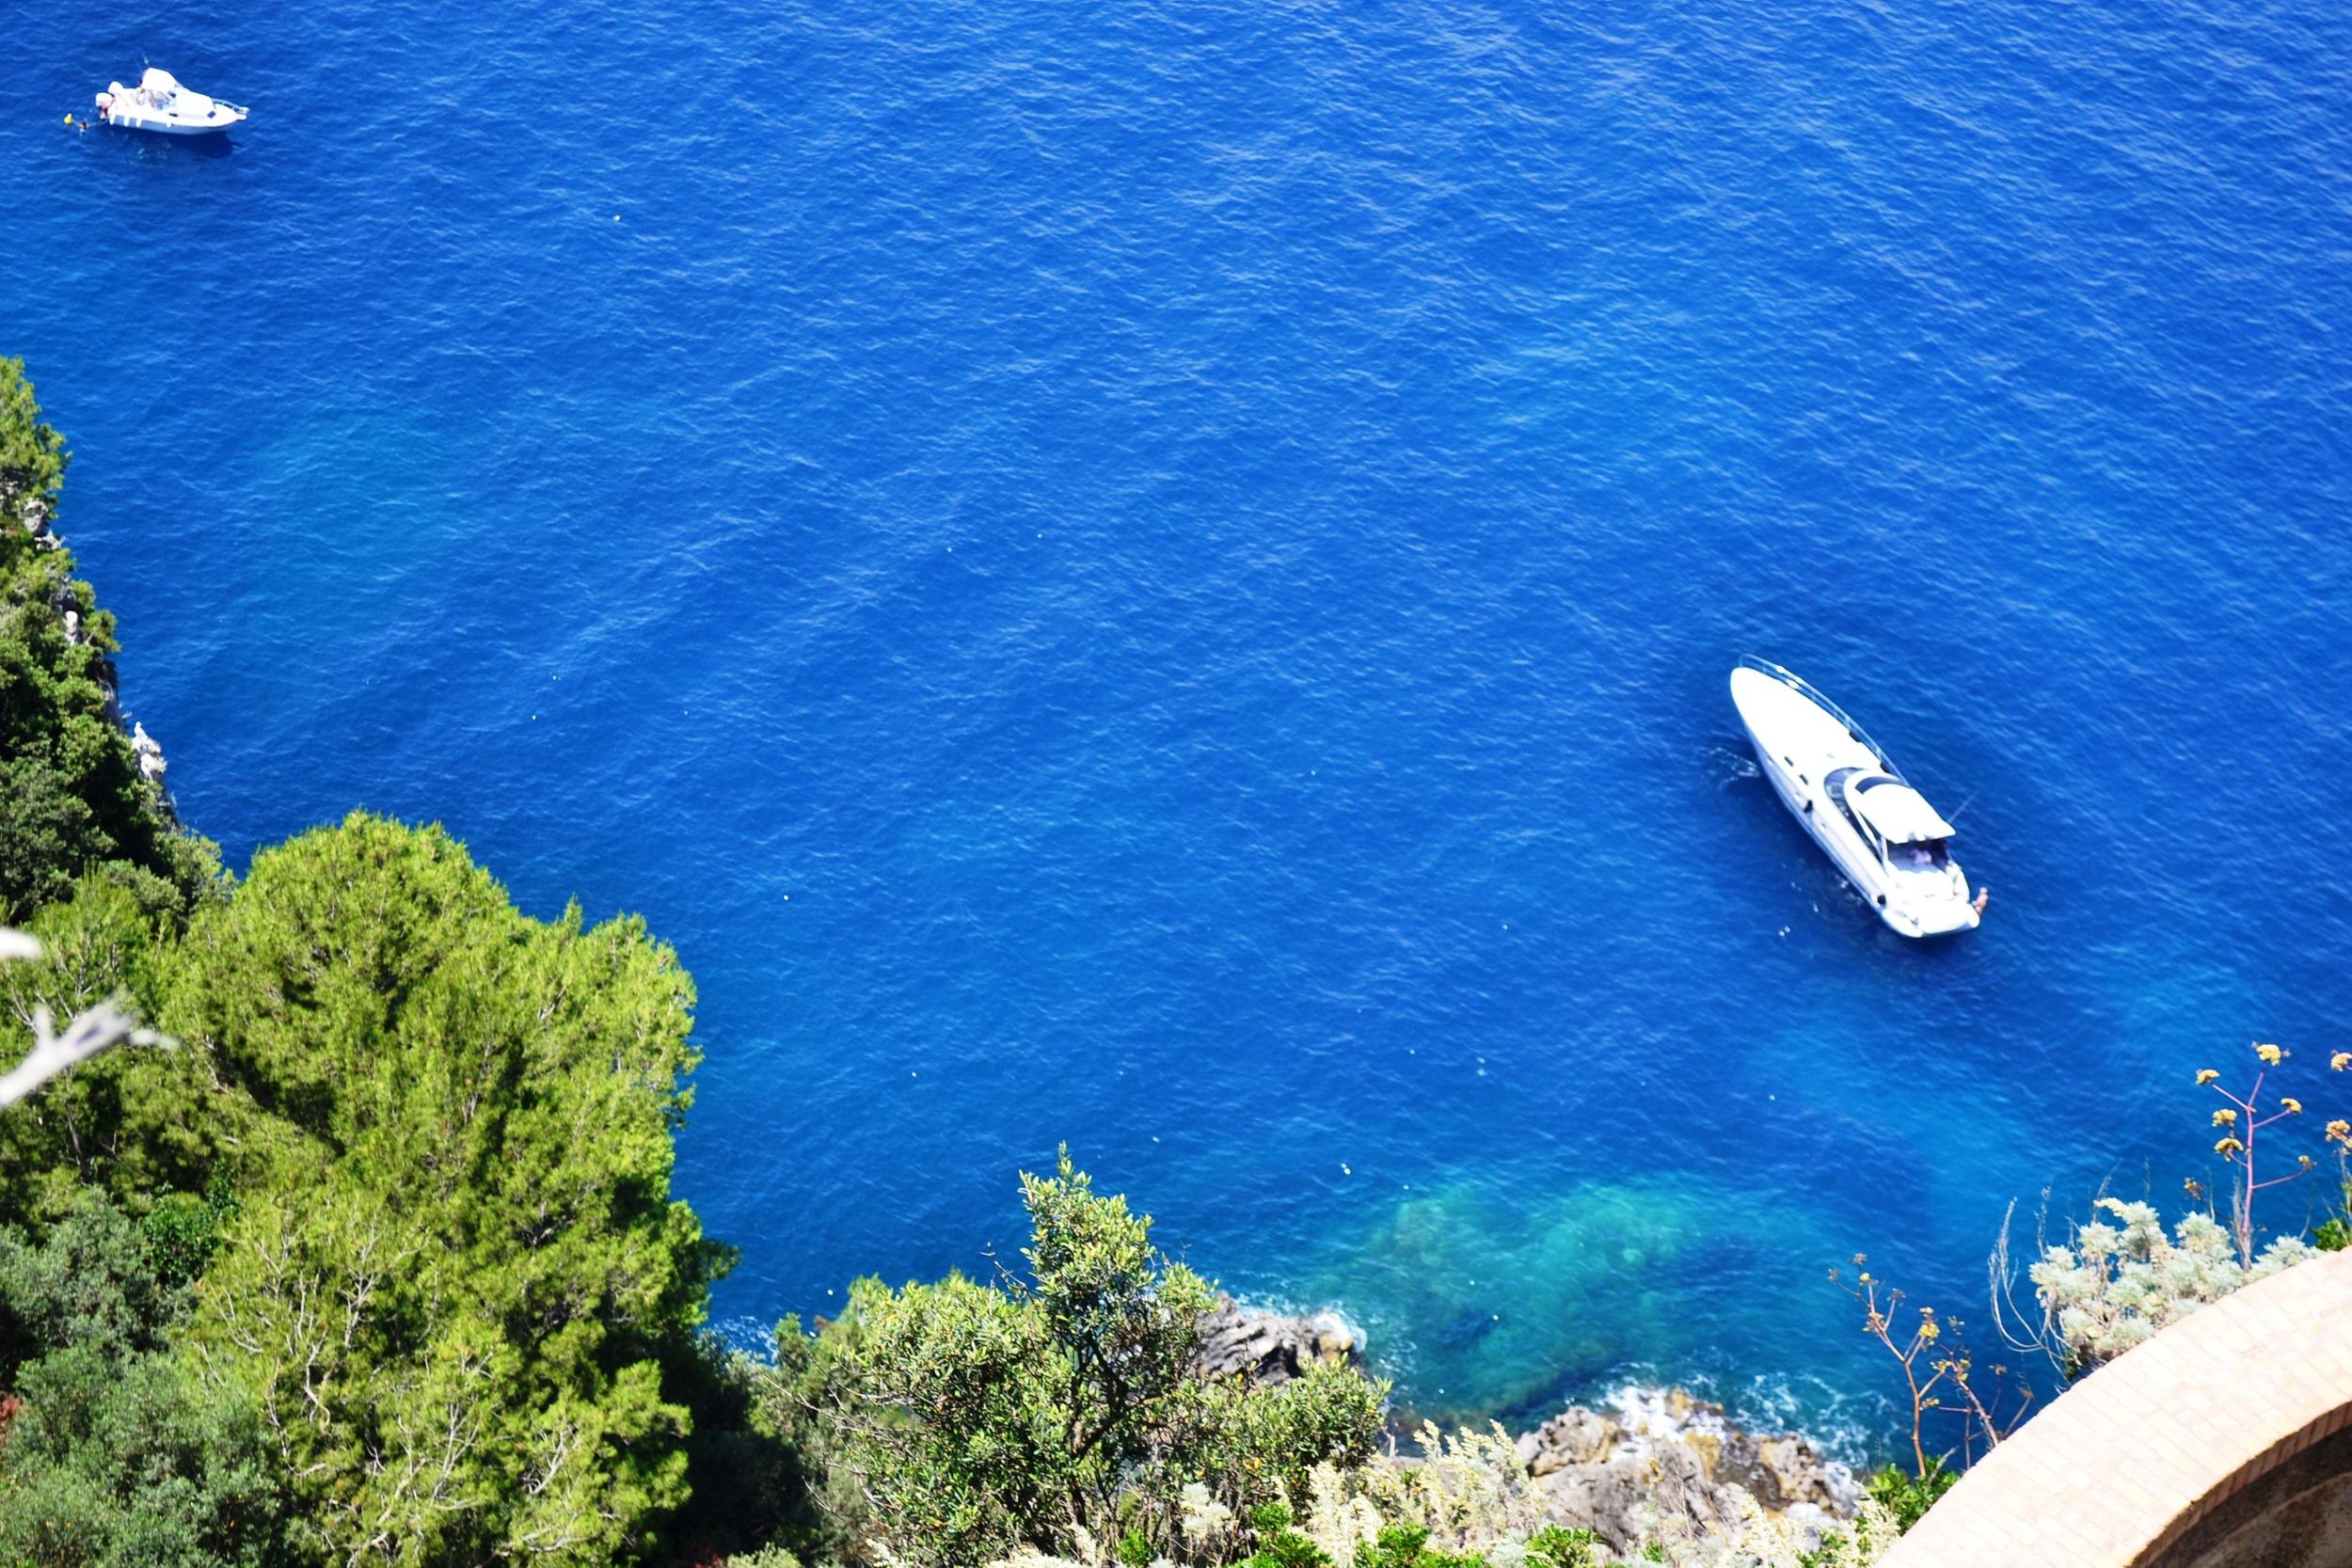 Blue-Water-in-Amalfi-Coast.jpg